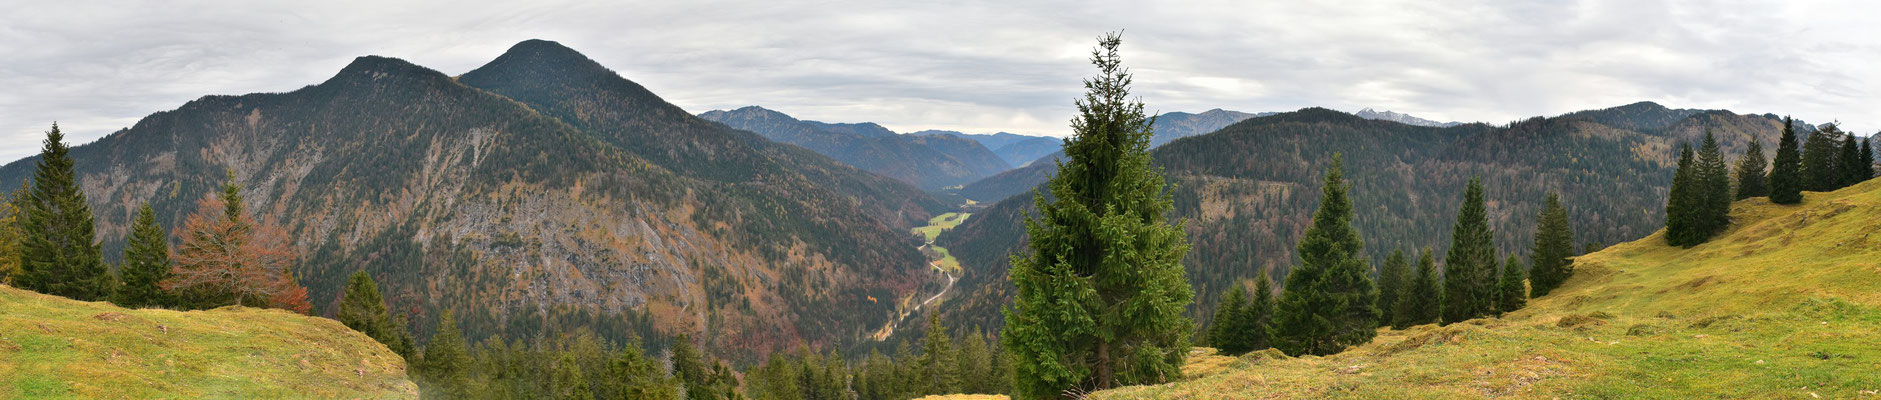 Panorama - Berge - Alpen - Wanderung - Seeberg